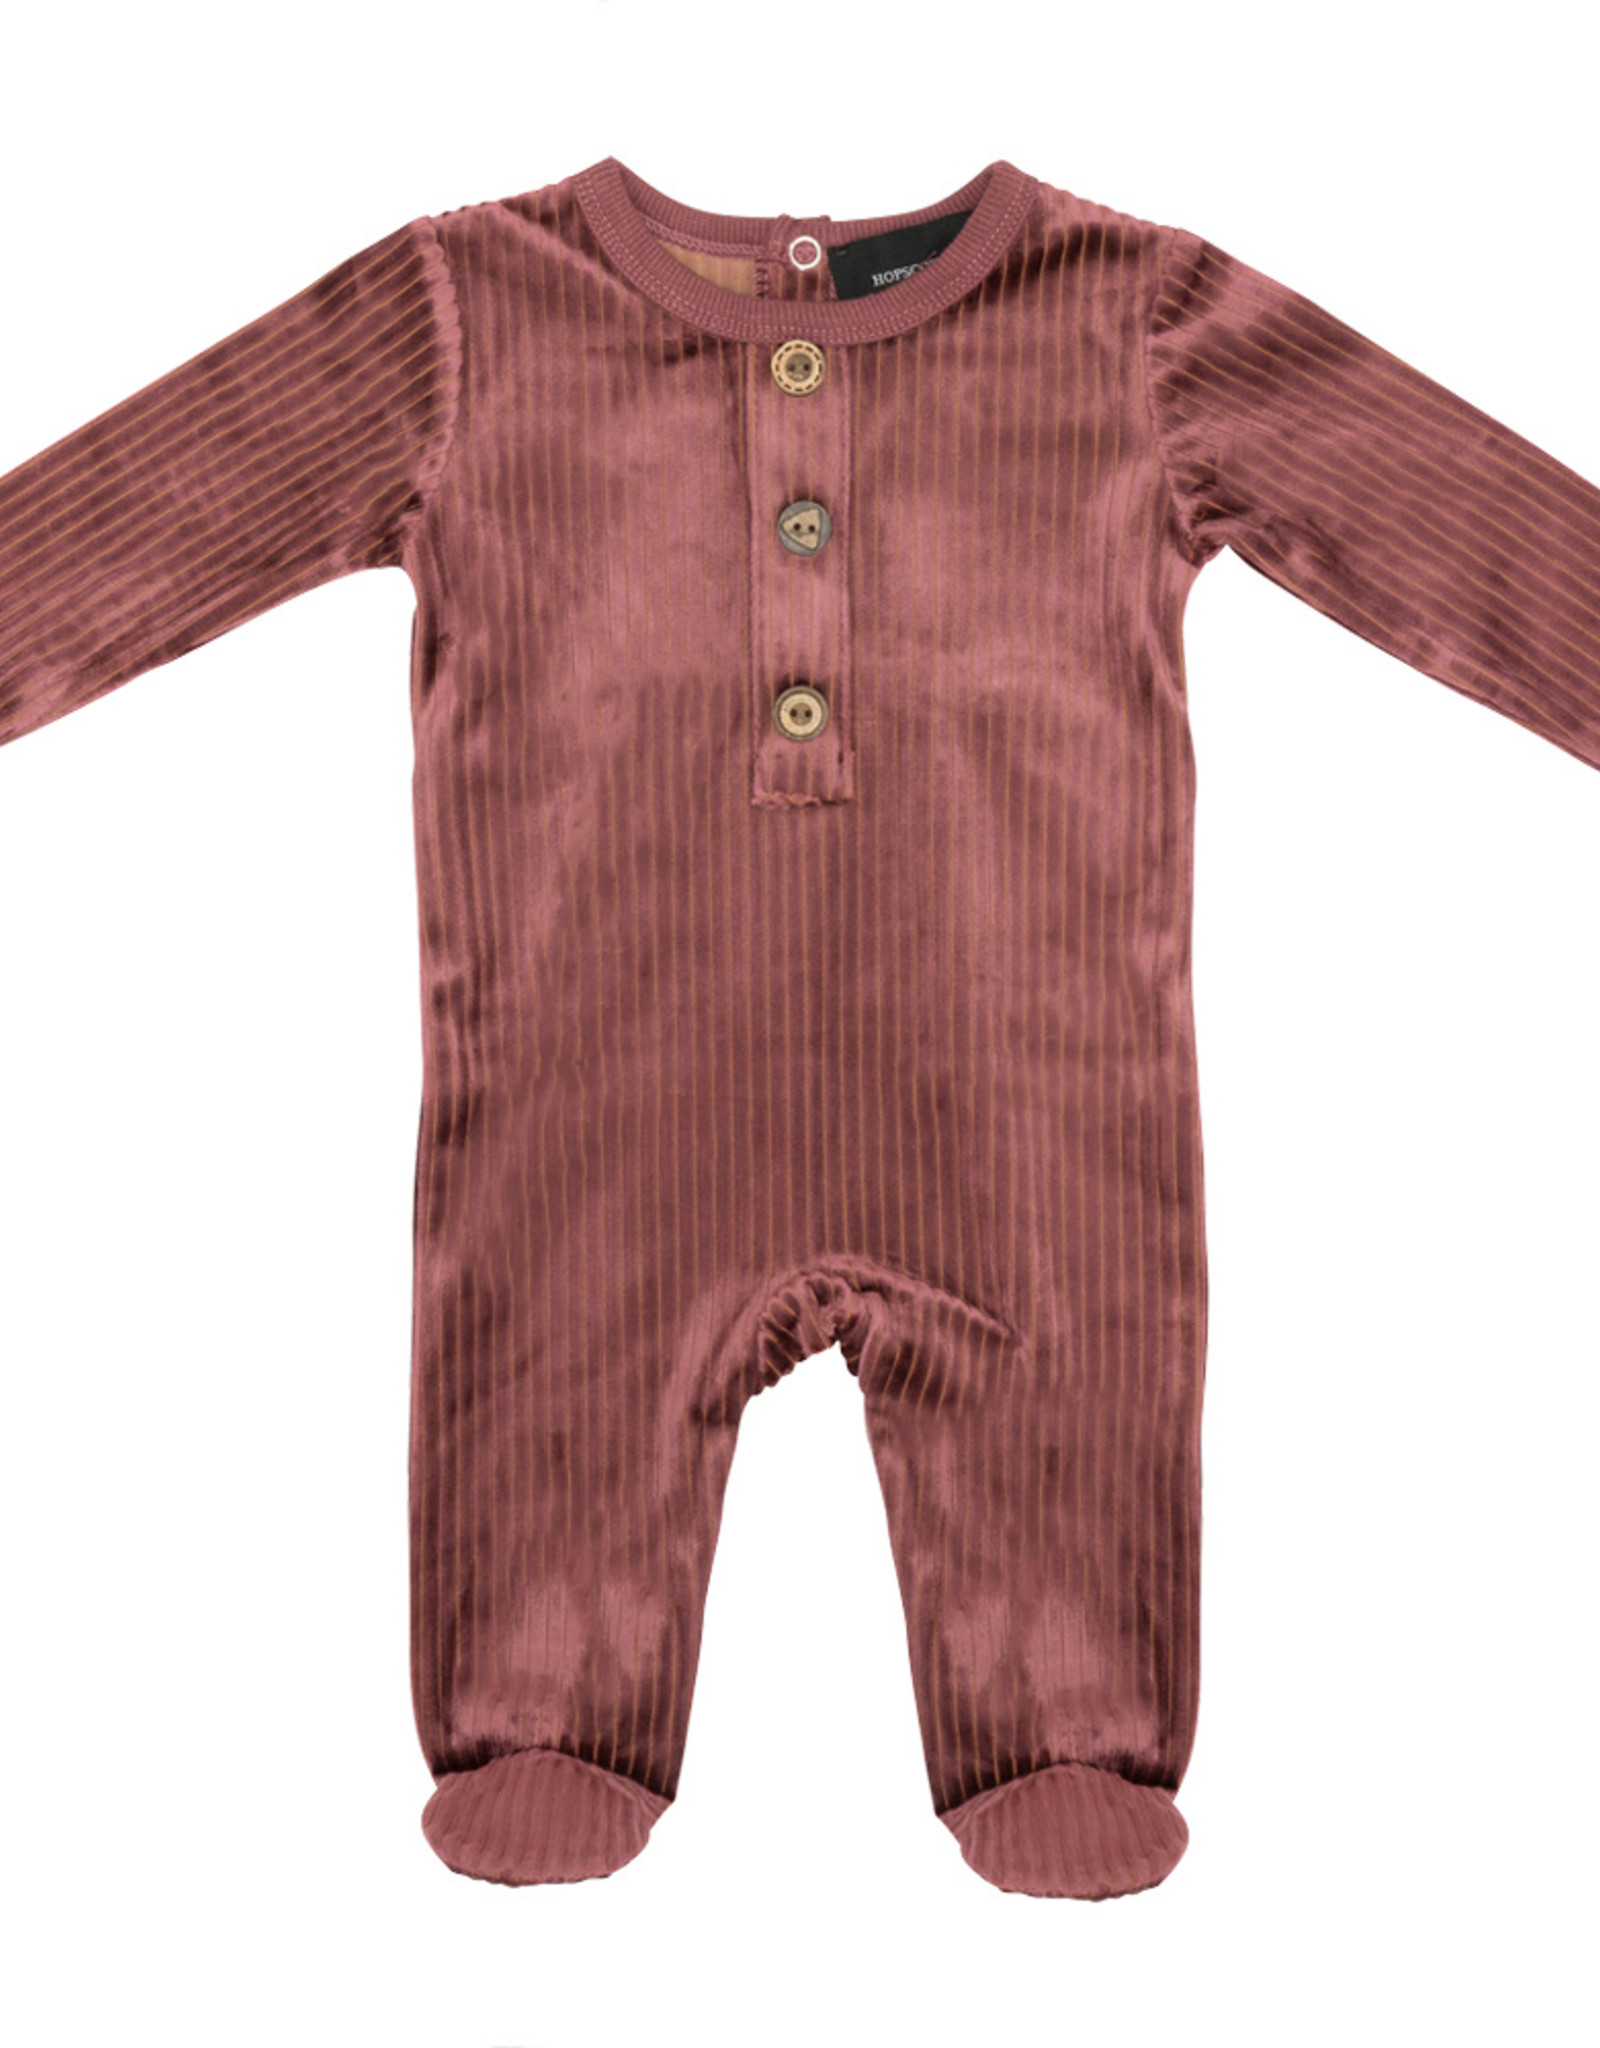 Hopscotch Hopscotch Velour Ribbed Footie Pajama With Button Detail